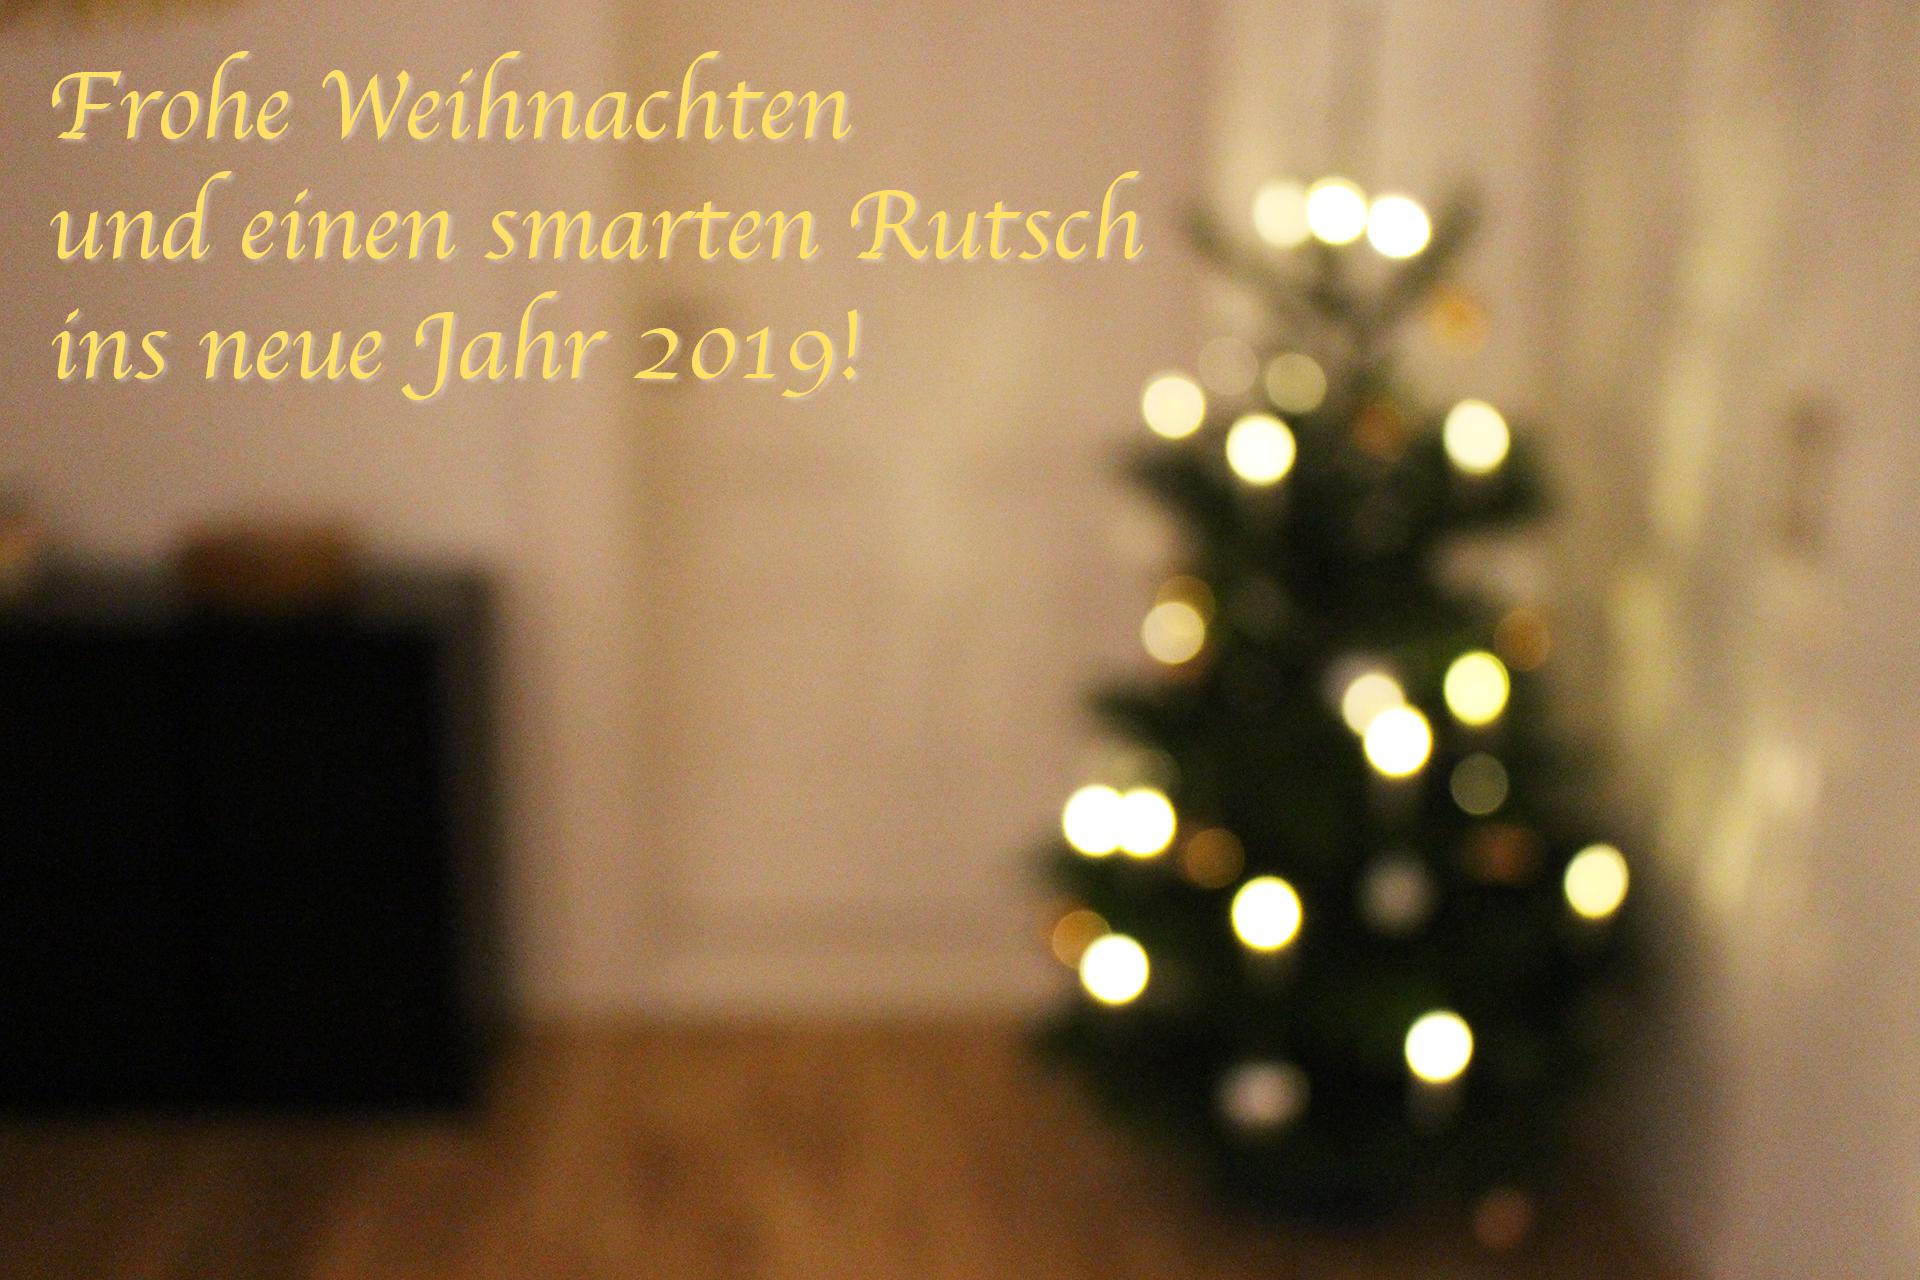 Titelbild_Frohe_Weihnachten